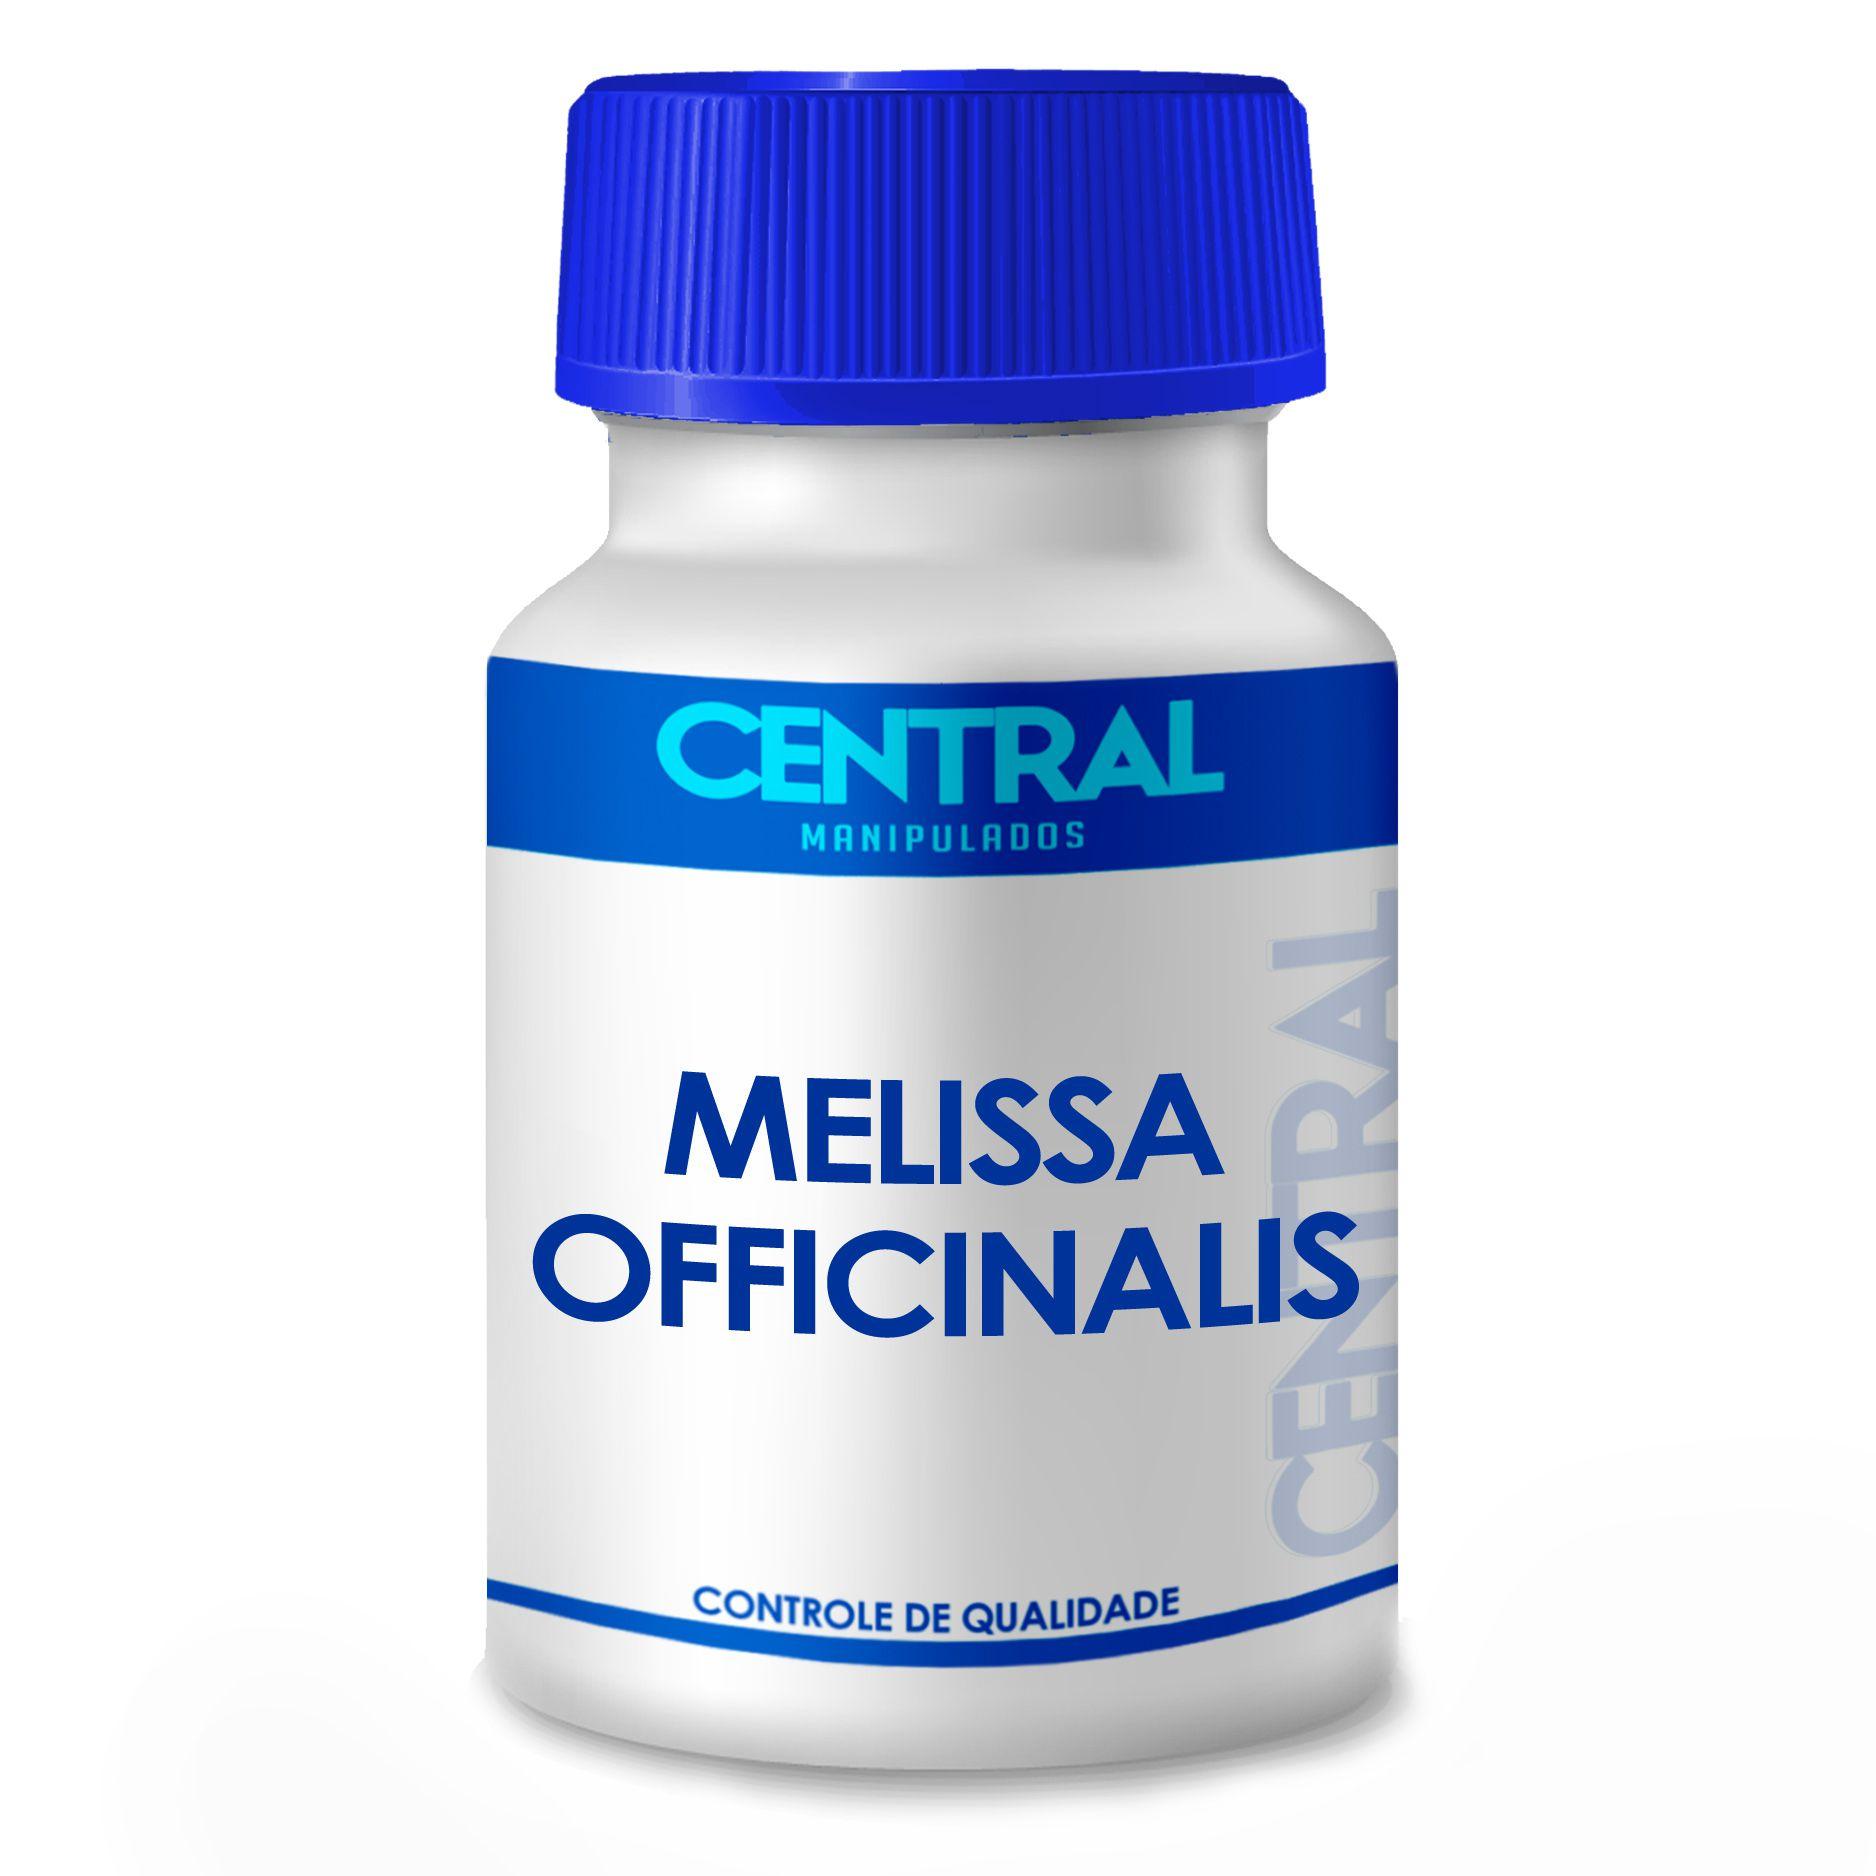 Melissa officinalis 500mg 120 cápsulas